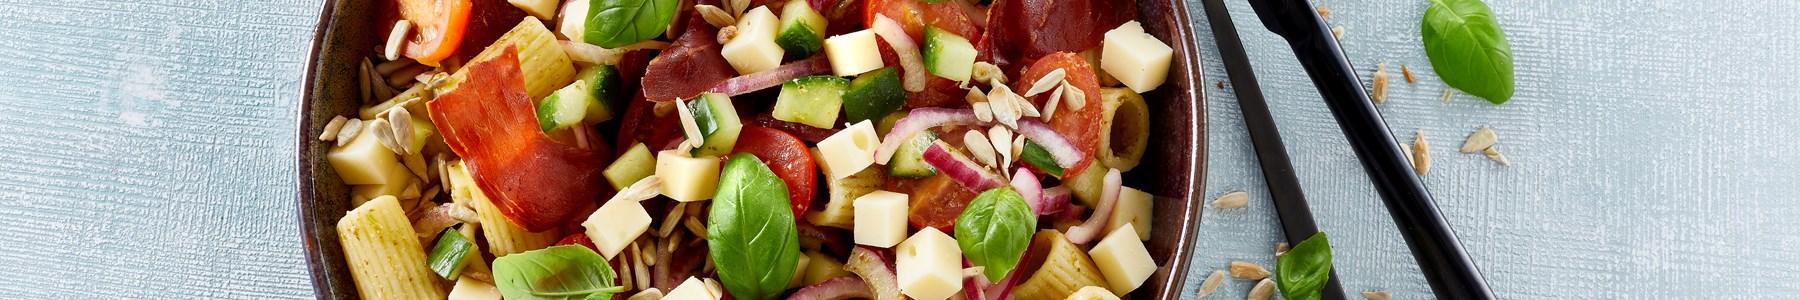 Salater + Danmark + Pasta